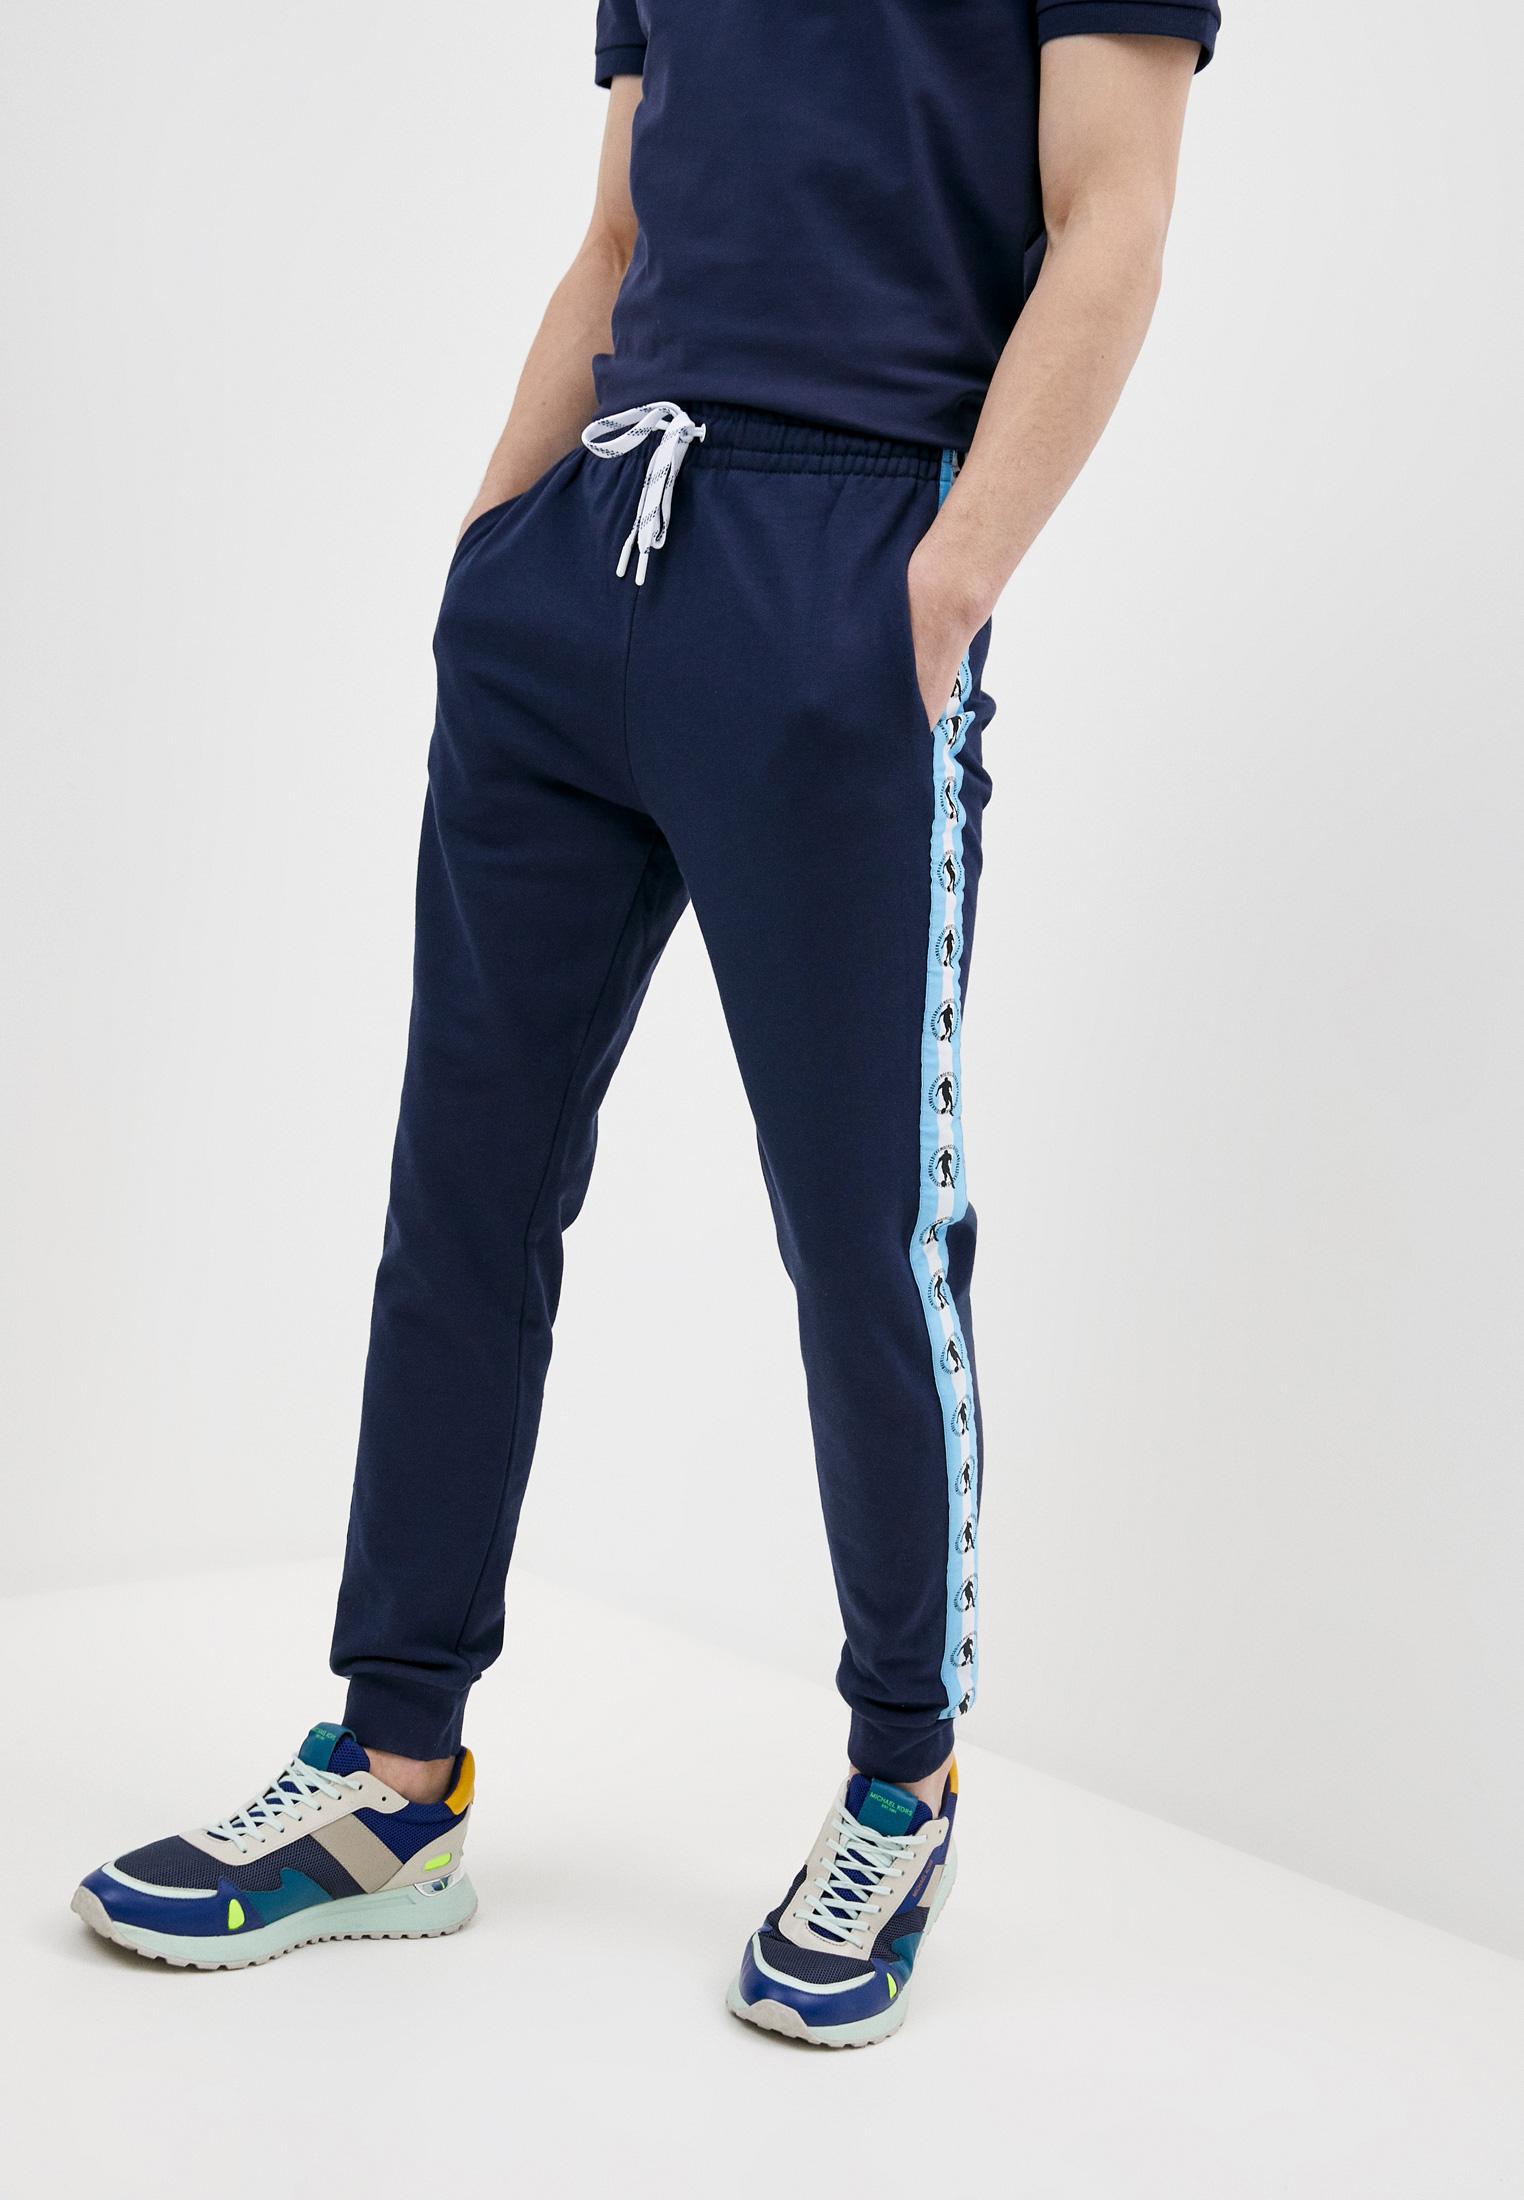 Мужские спортивные брюки Bikkembergs (Биккембергс) C 1 182 80 M 4278